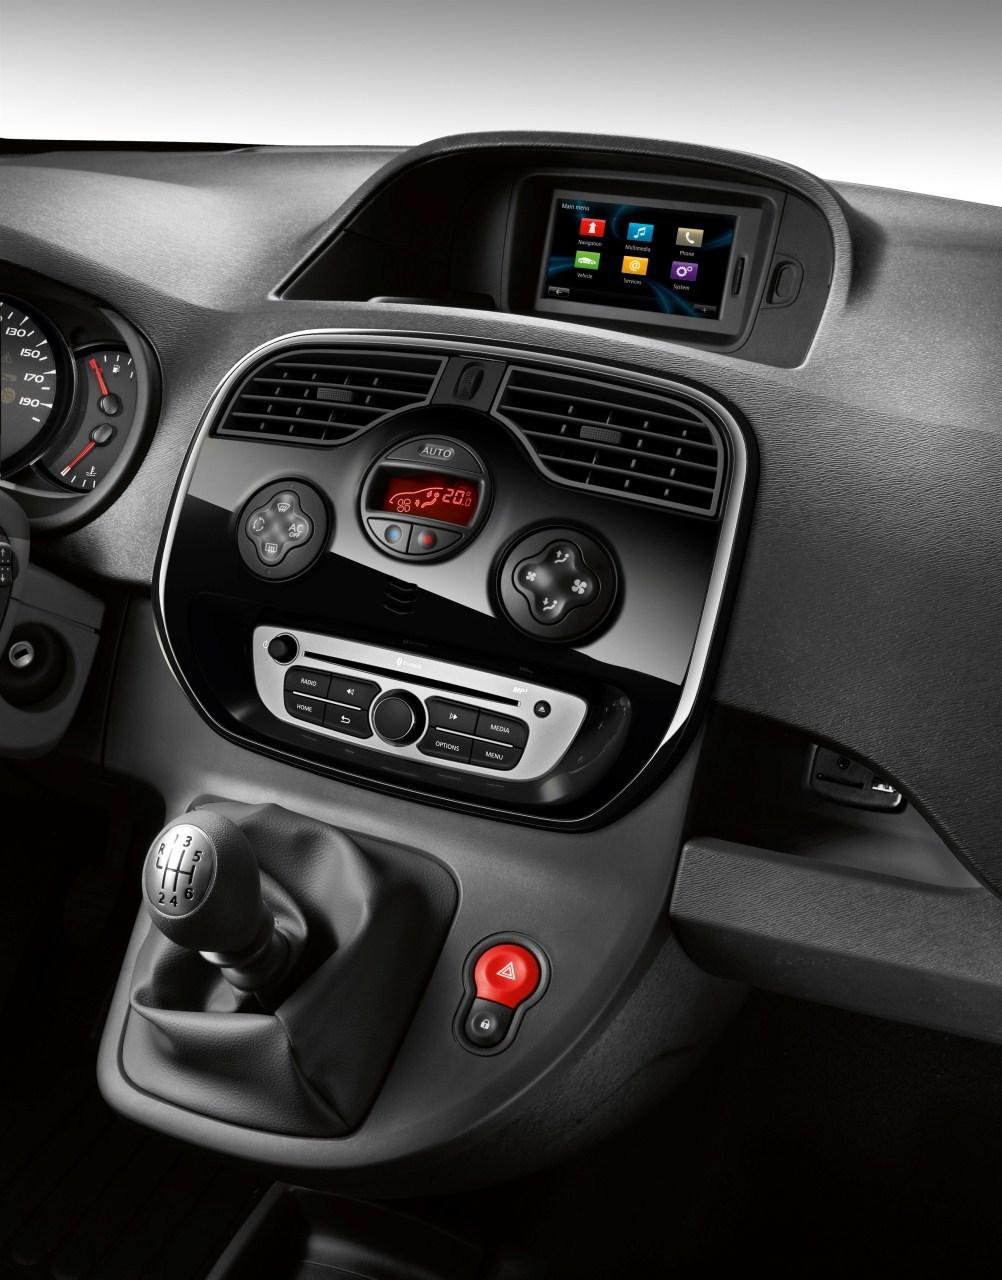 Foto de Renault Kangoo 2013 (6/6)